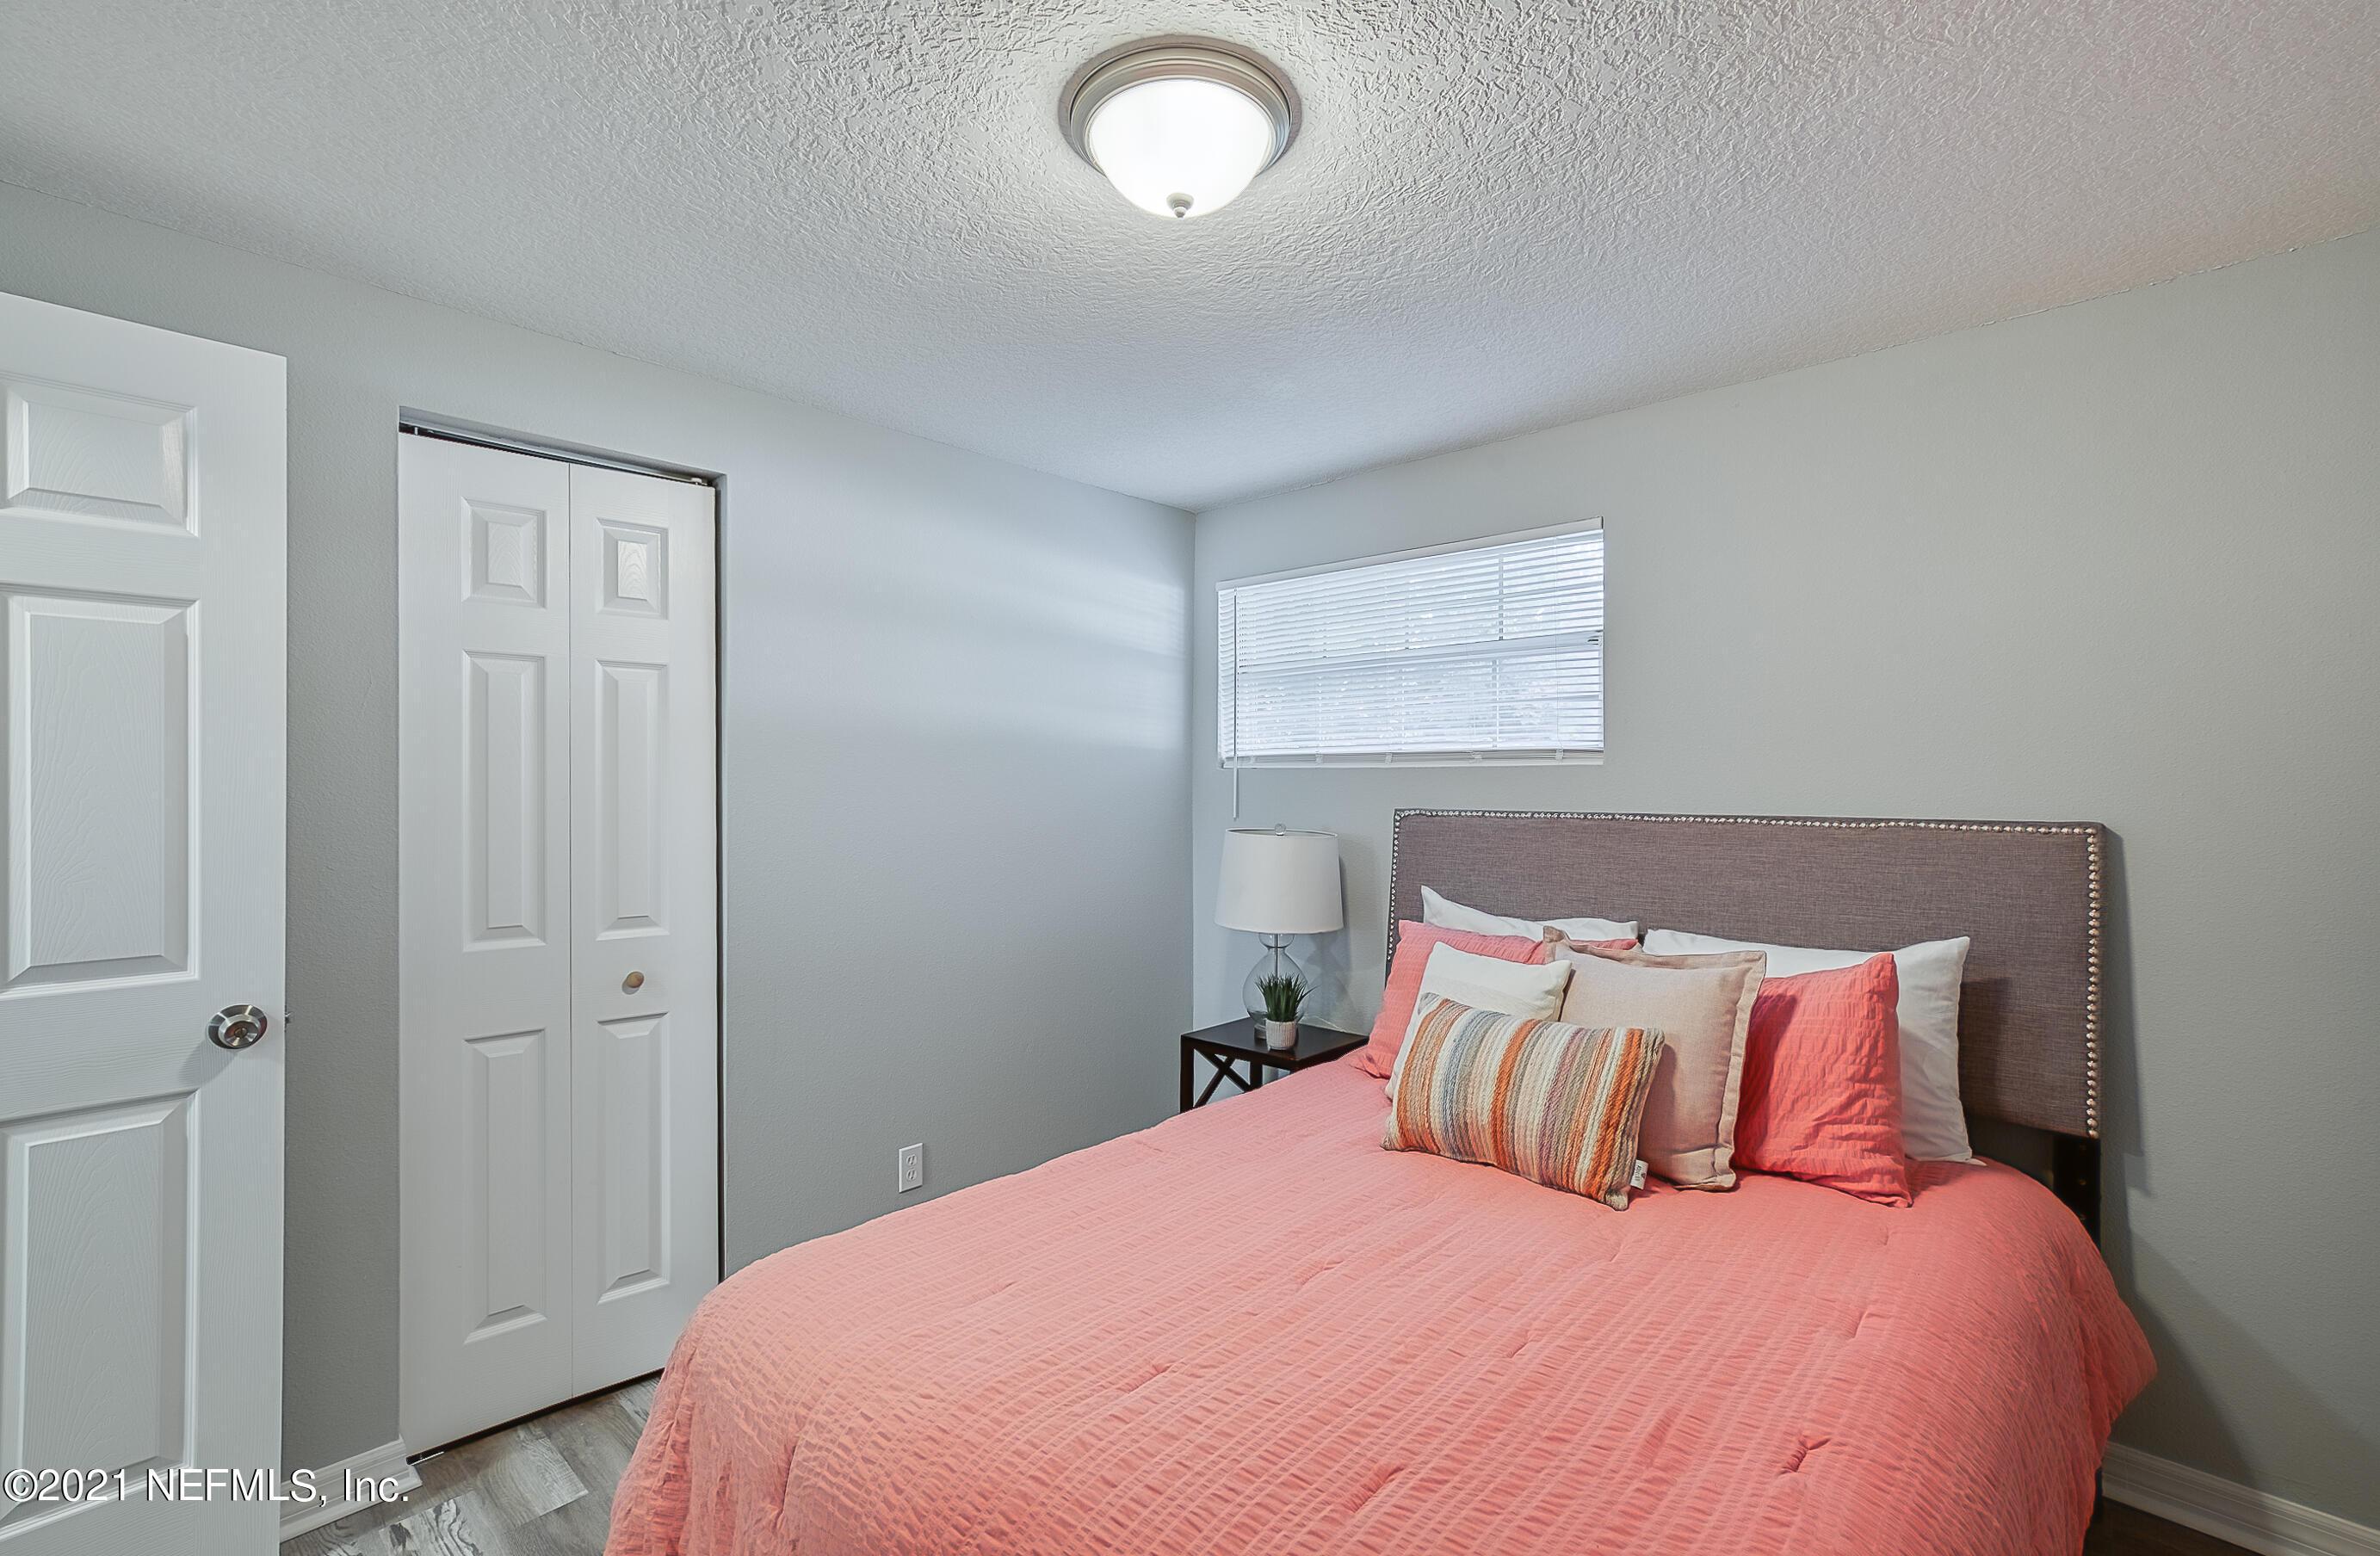 335 ARORA, ORANGE PARK, FLORIDA 32073, 4 Bedrooms Bedrooms, ,3 BathroomsBathrooms,Residential,For sale,ARORA,1135694